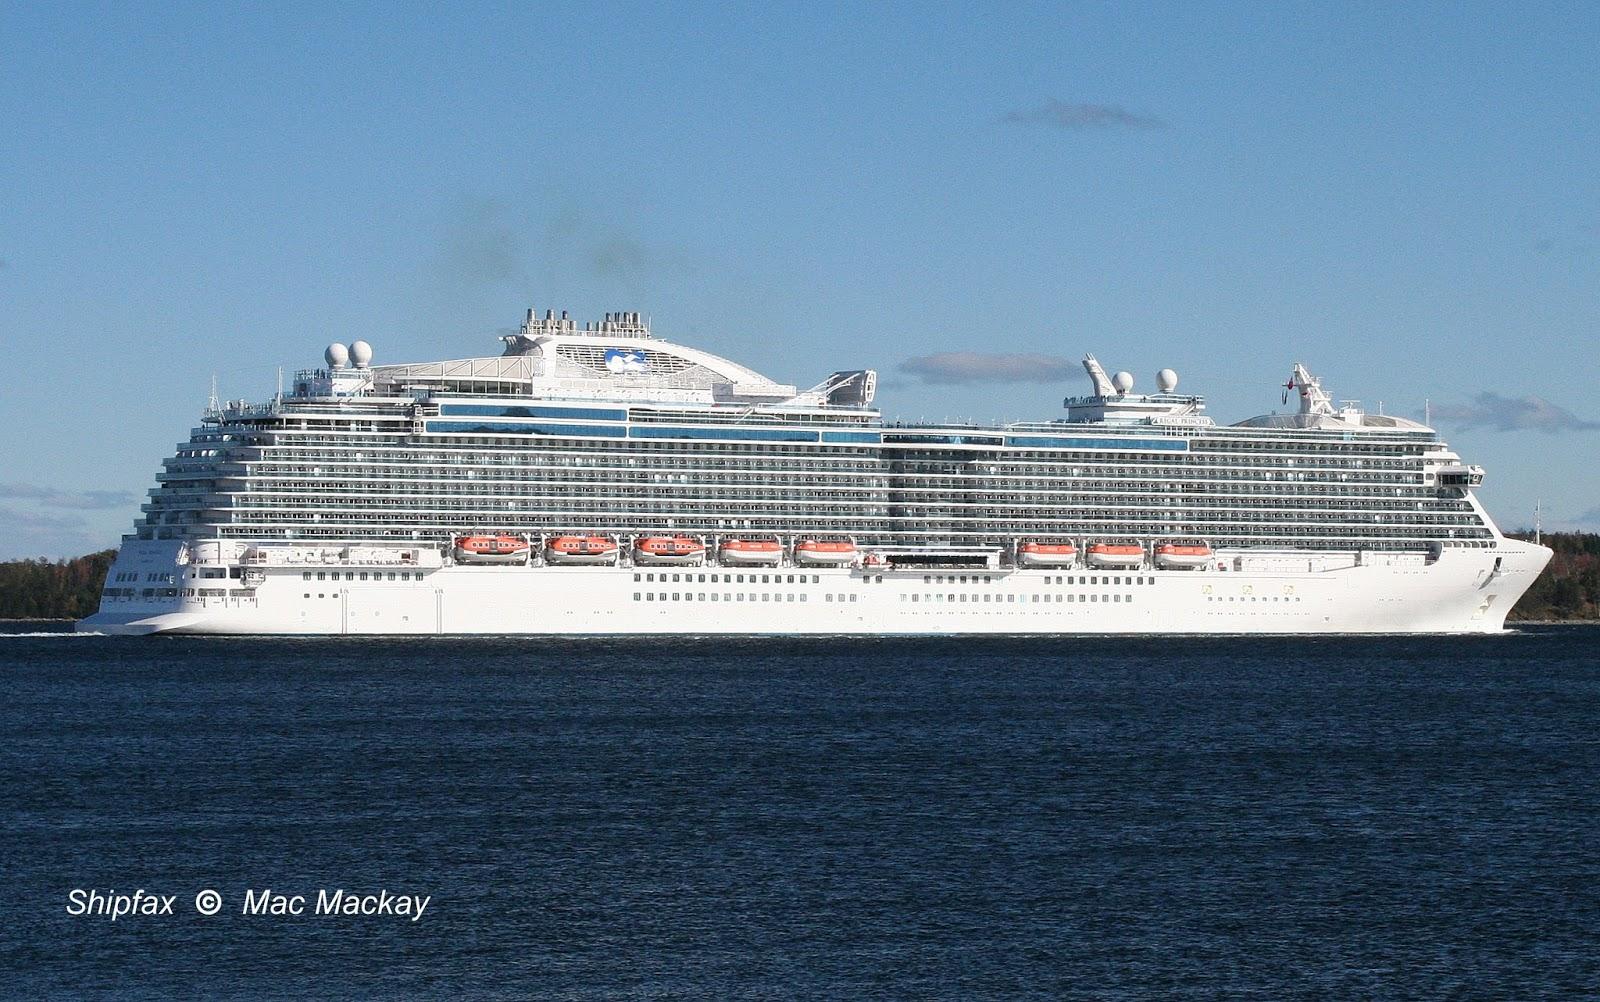 Shipfax Regal Princess Big Ship But